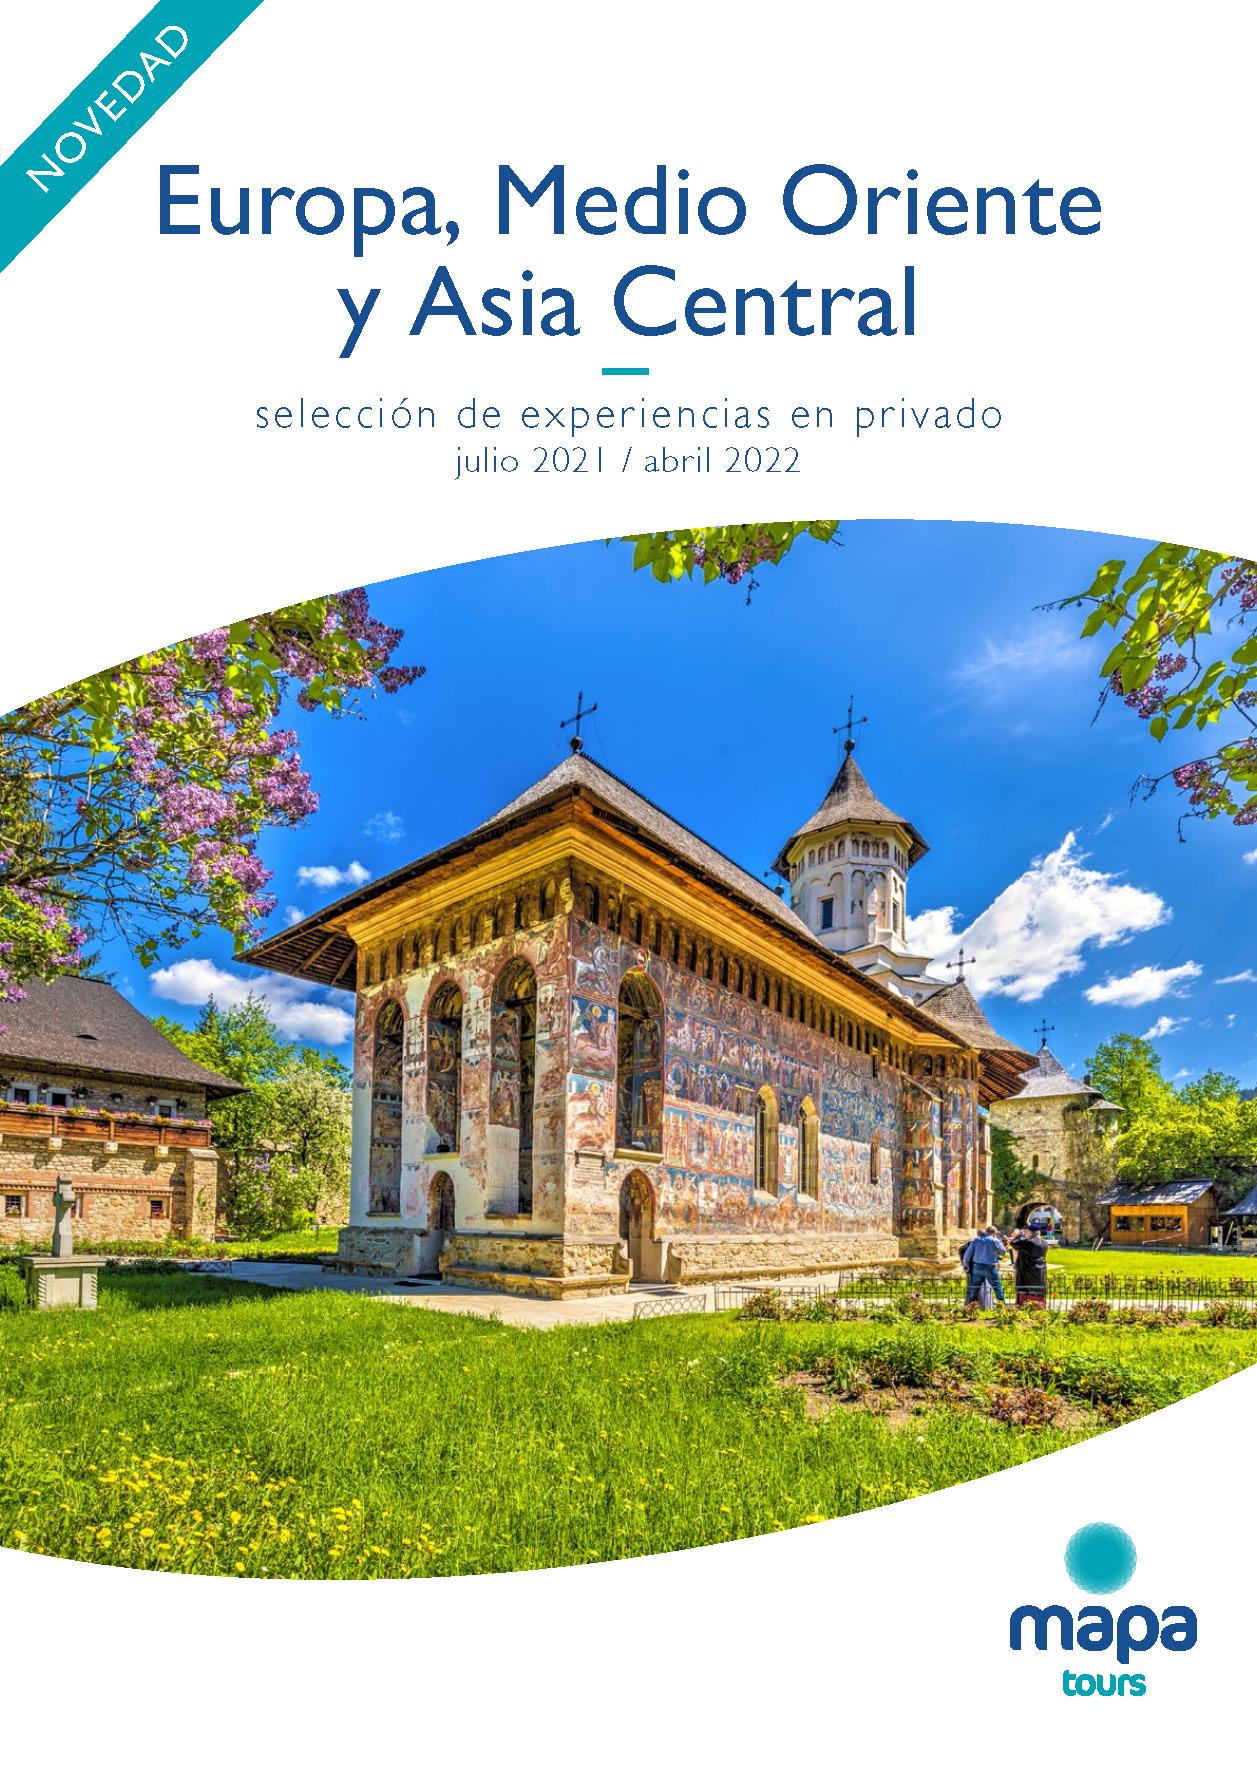 Catalogo Mapa Tours Europa Oriente Medio y Asia Central en privado 2021-2022